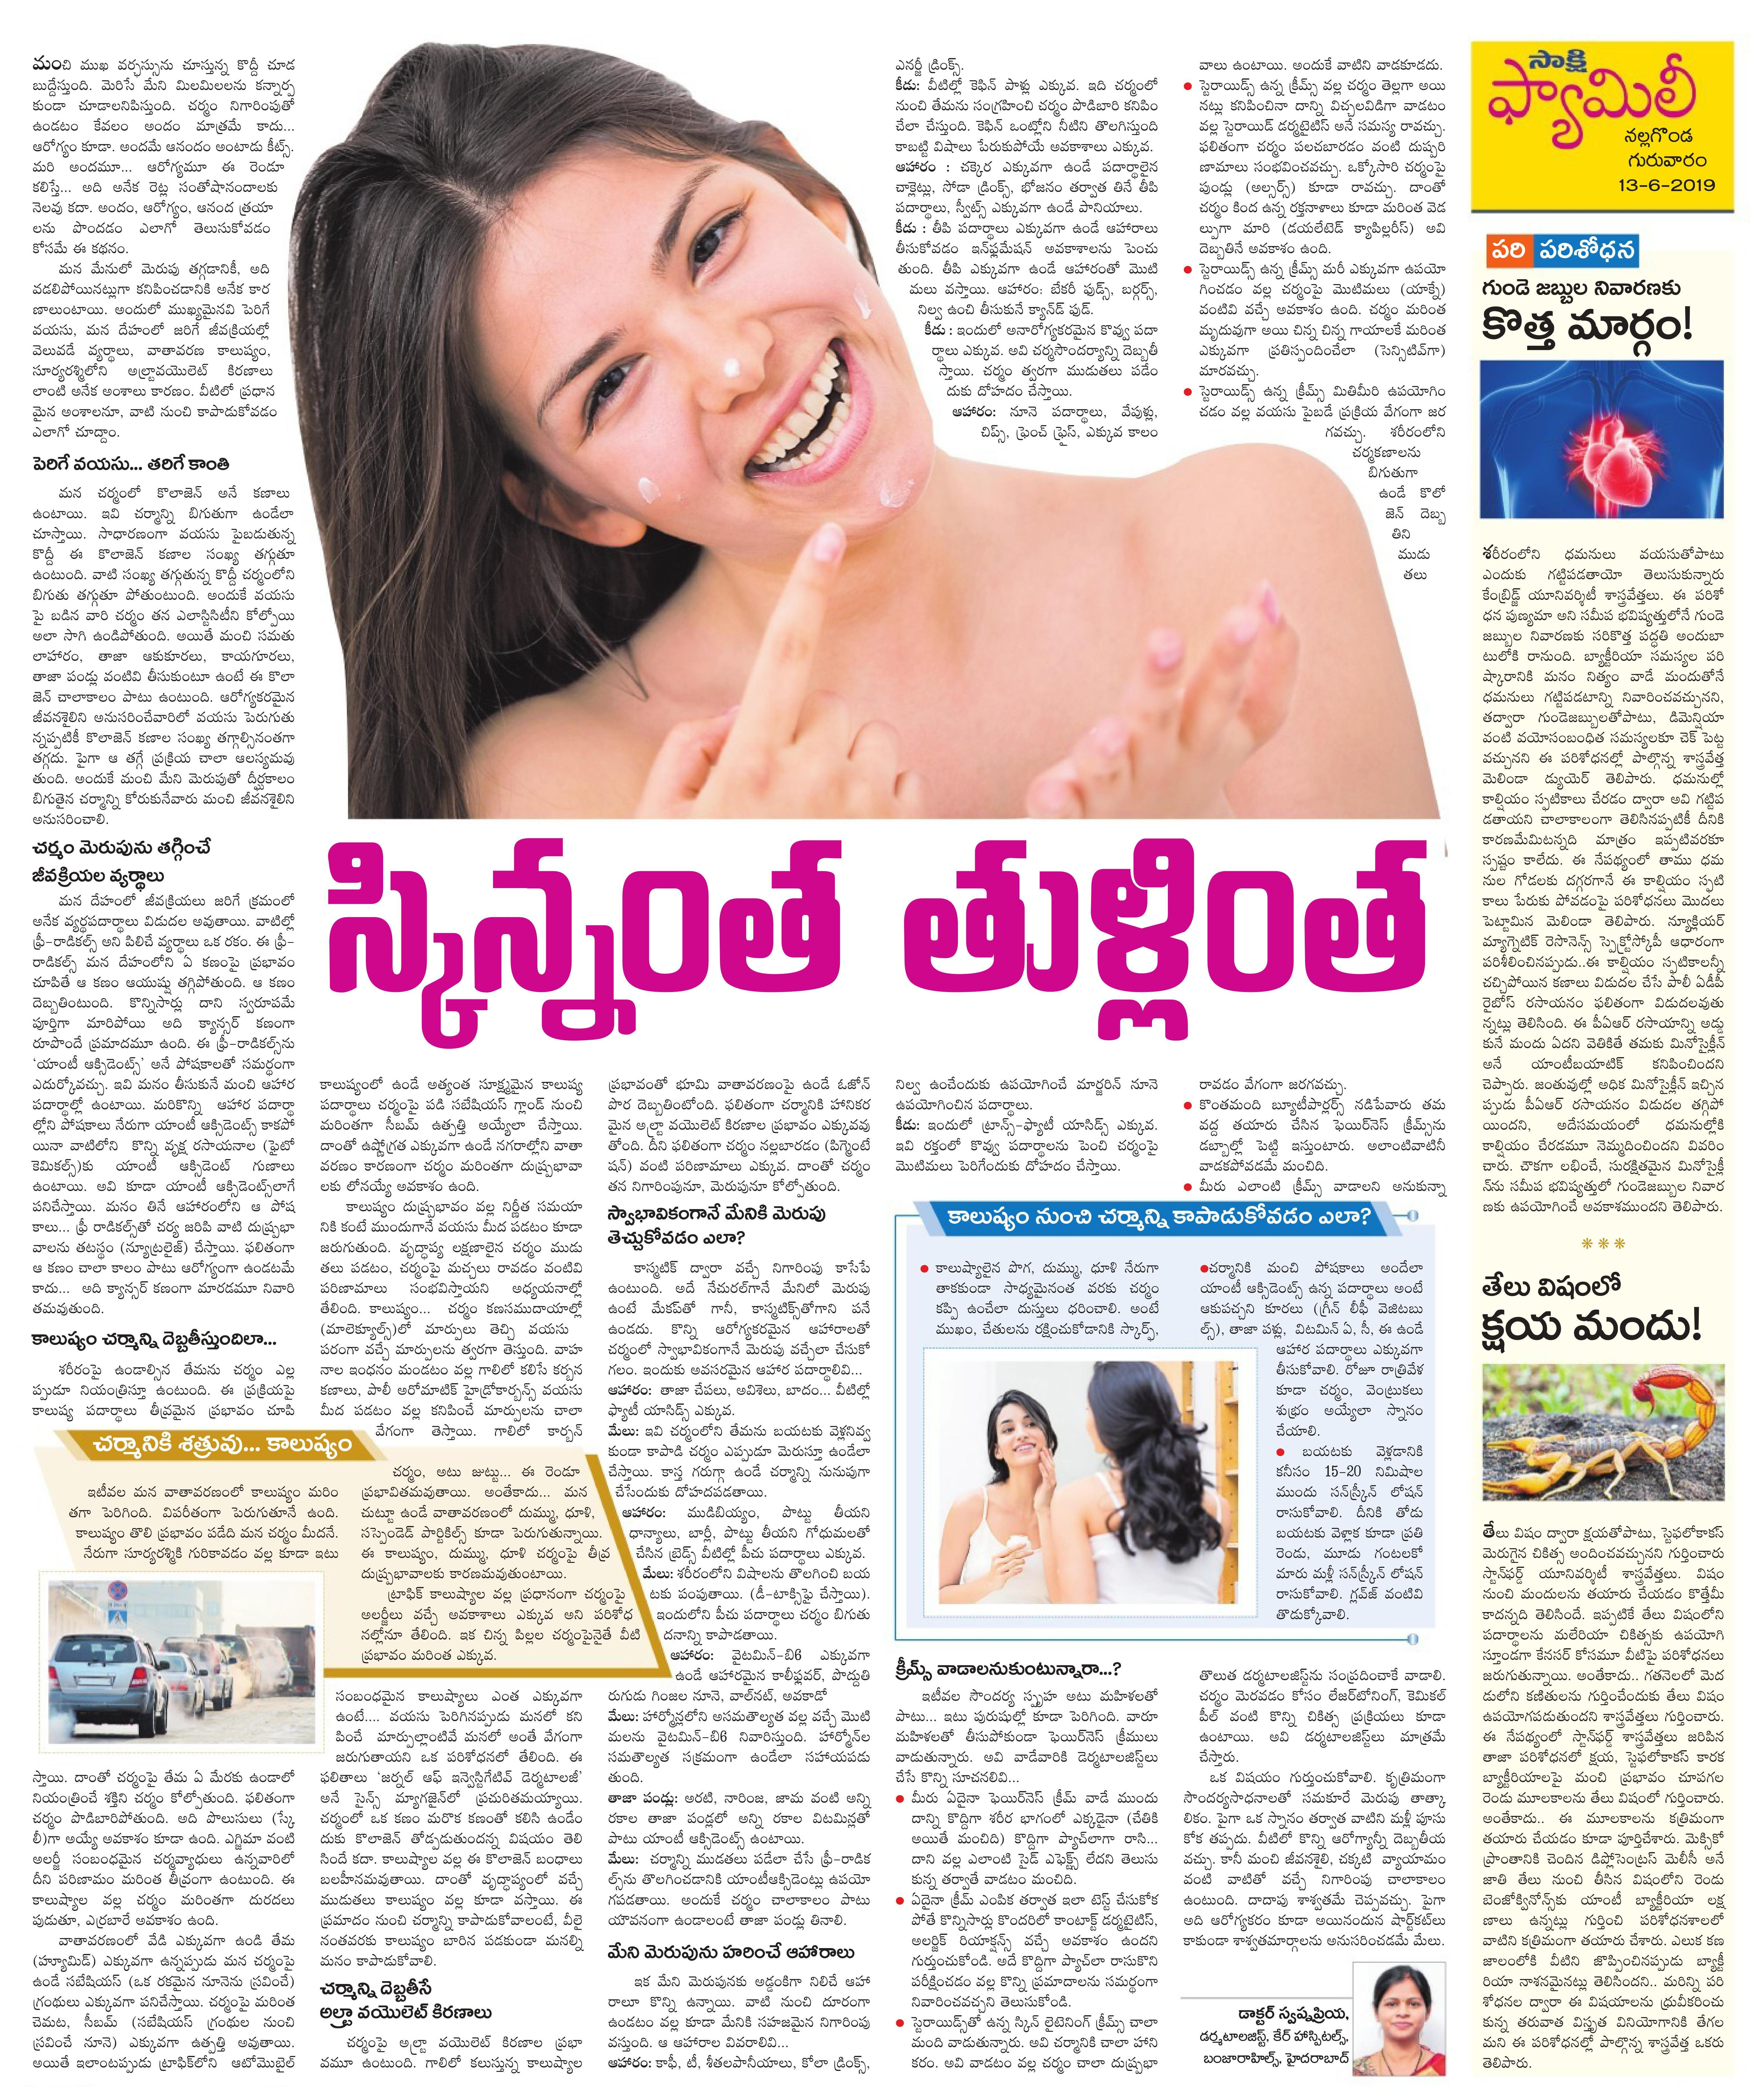 Best Skin Glowing tips by Dr Swapna Priya, One of the best dermatologist in hyderabad